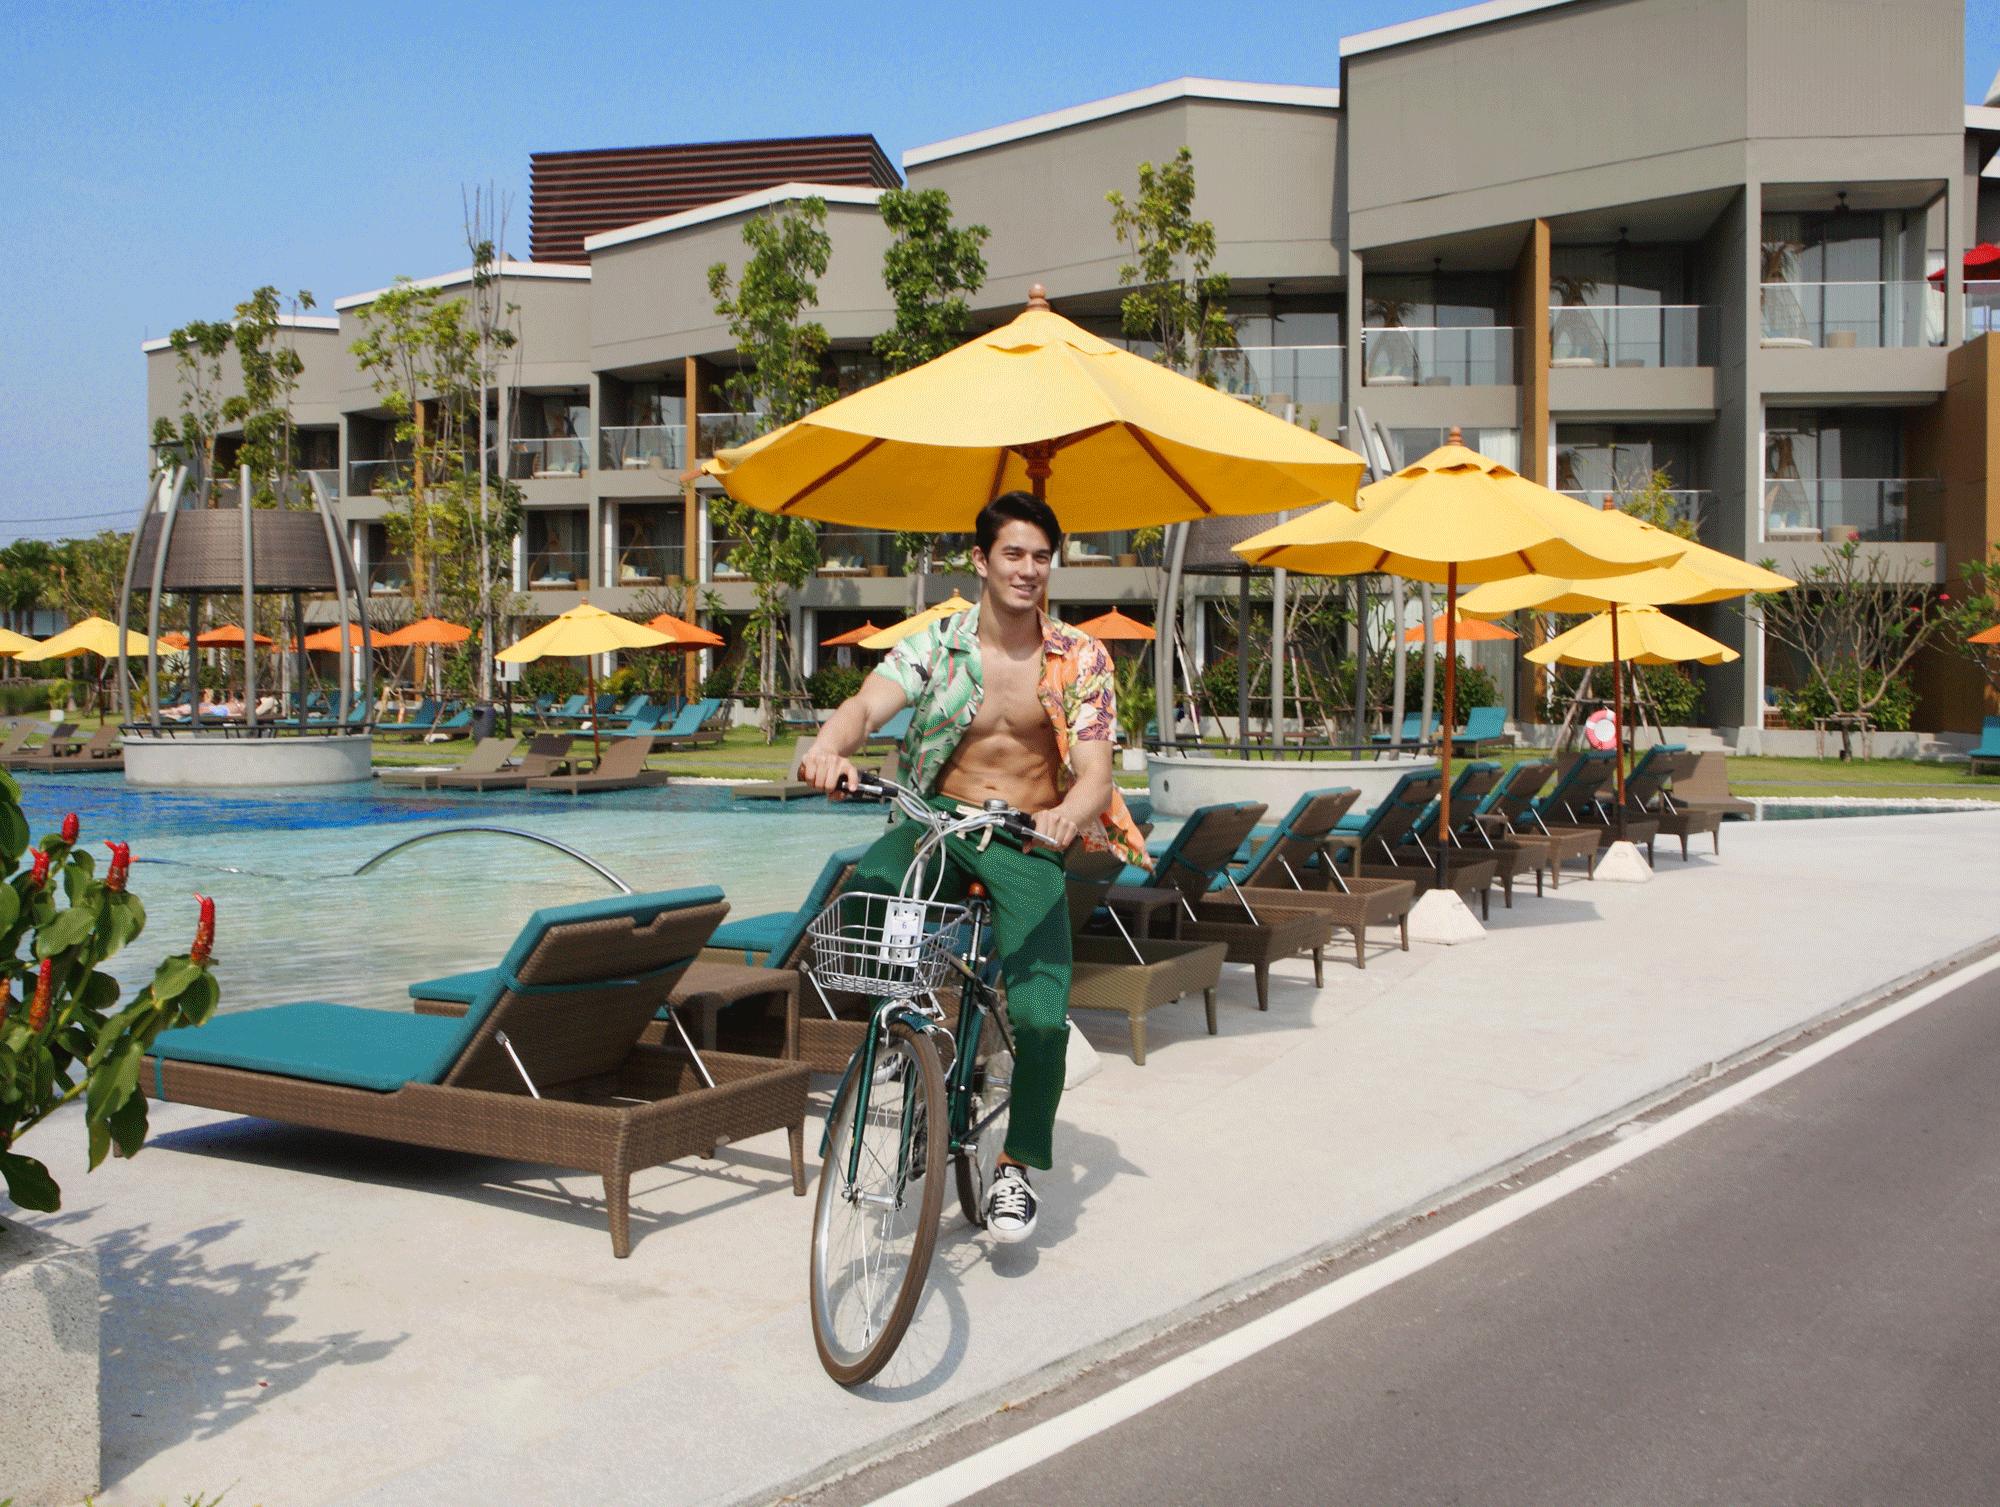 AVANI Hua Hin Resort & Villas  Photo : Tu Virapoj Asavajarn  Model : Matheus Song @metheussongf from@redmodelling  Clothes : CV_Homme @cv-homme  Leisure Projects @leisureprojects  Location : AVANI Hua Hin Resort & Villas  1499 Phet Kasem Rd, Cha-am, Phetchaburi 76120  Tel. 032 898 989  www.minorhotels.com